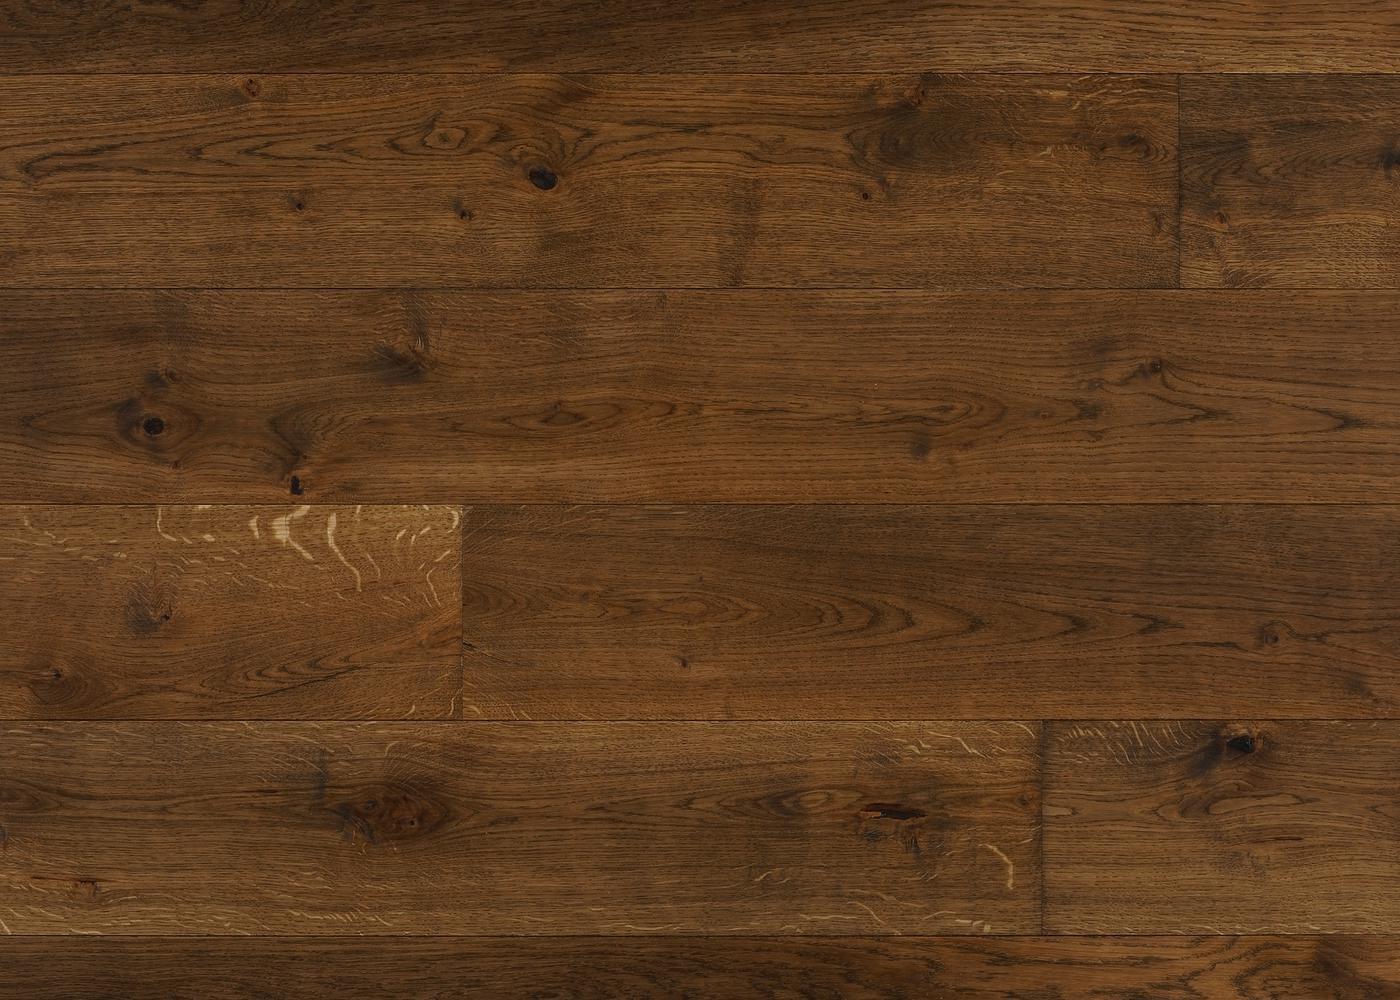 Parquet chêne massif OTTAWA Elégance vieilli très accentué huile cire 14x110x500-2000